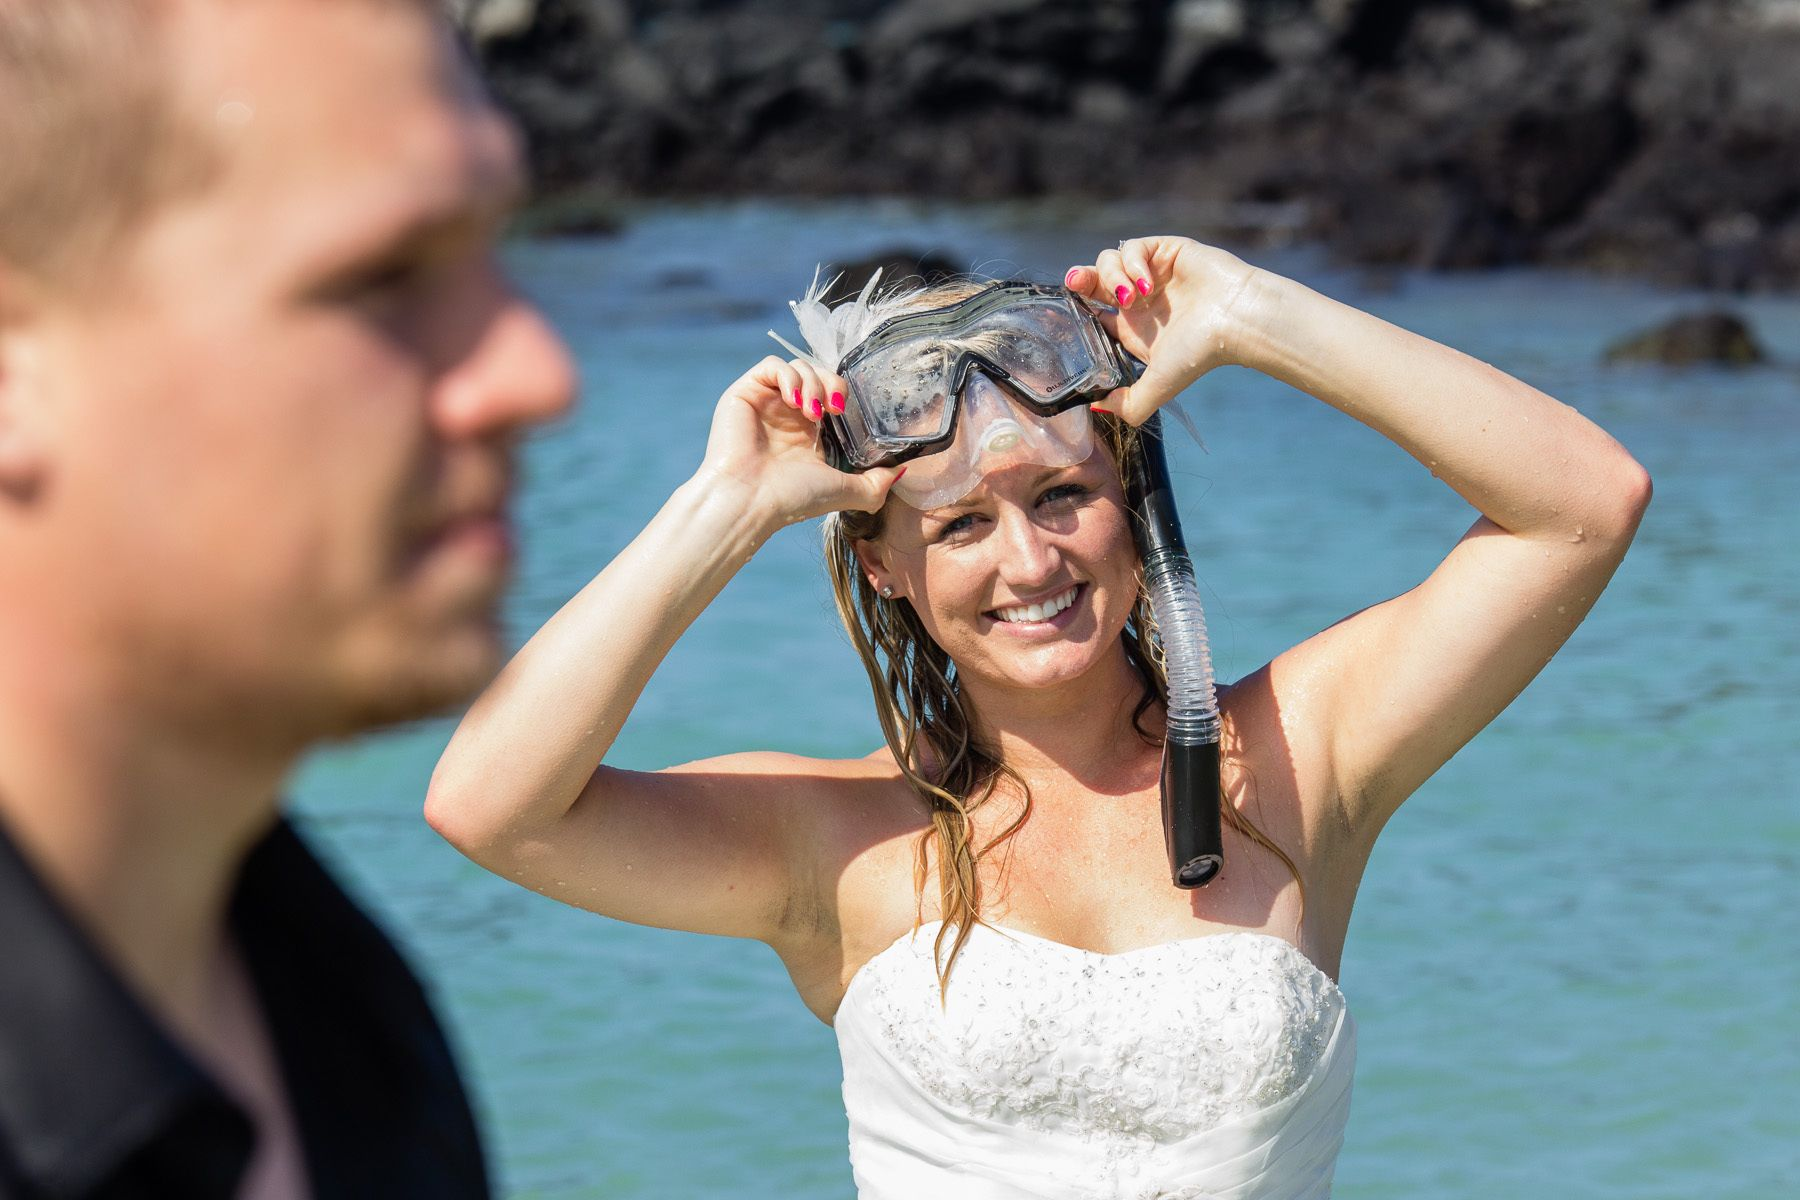 1kailua_kona__honolulu__hawaii__wedding__photographer_1441